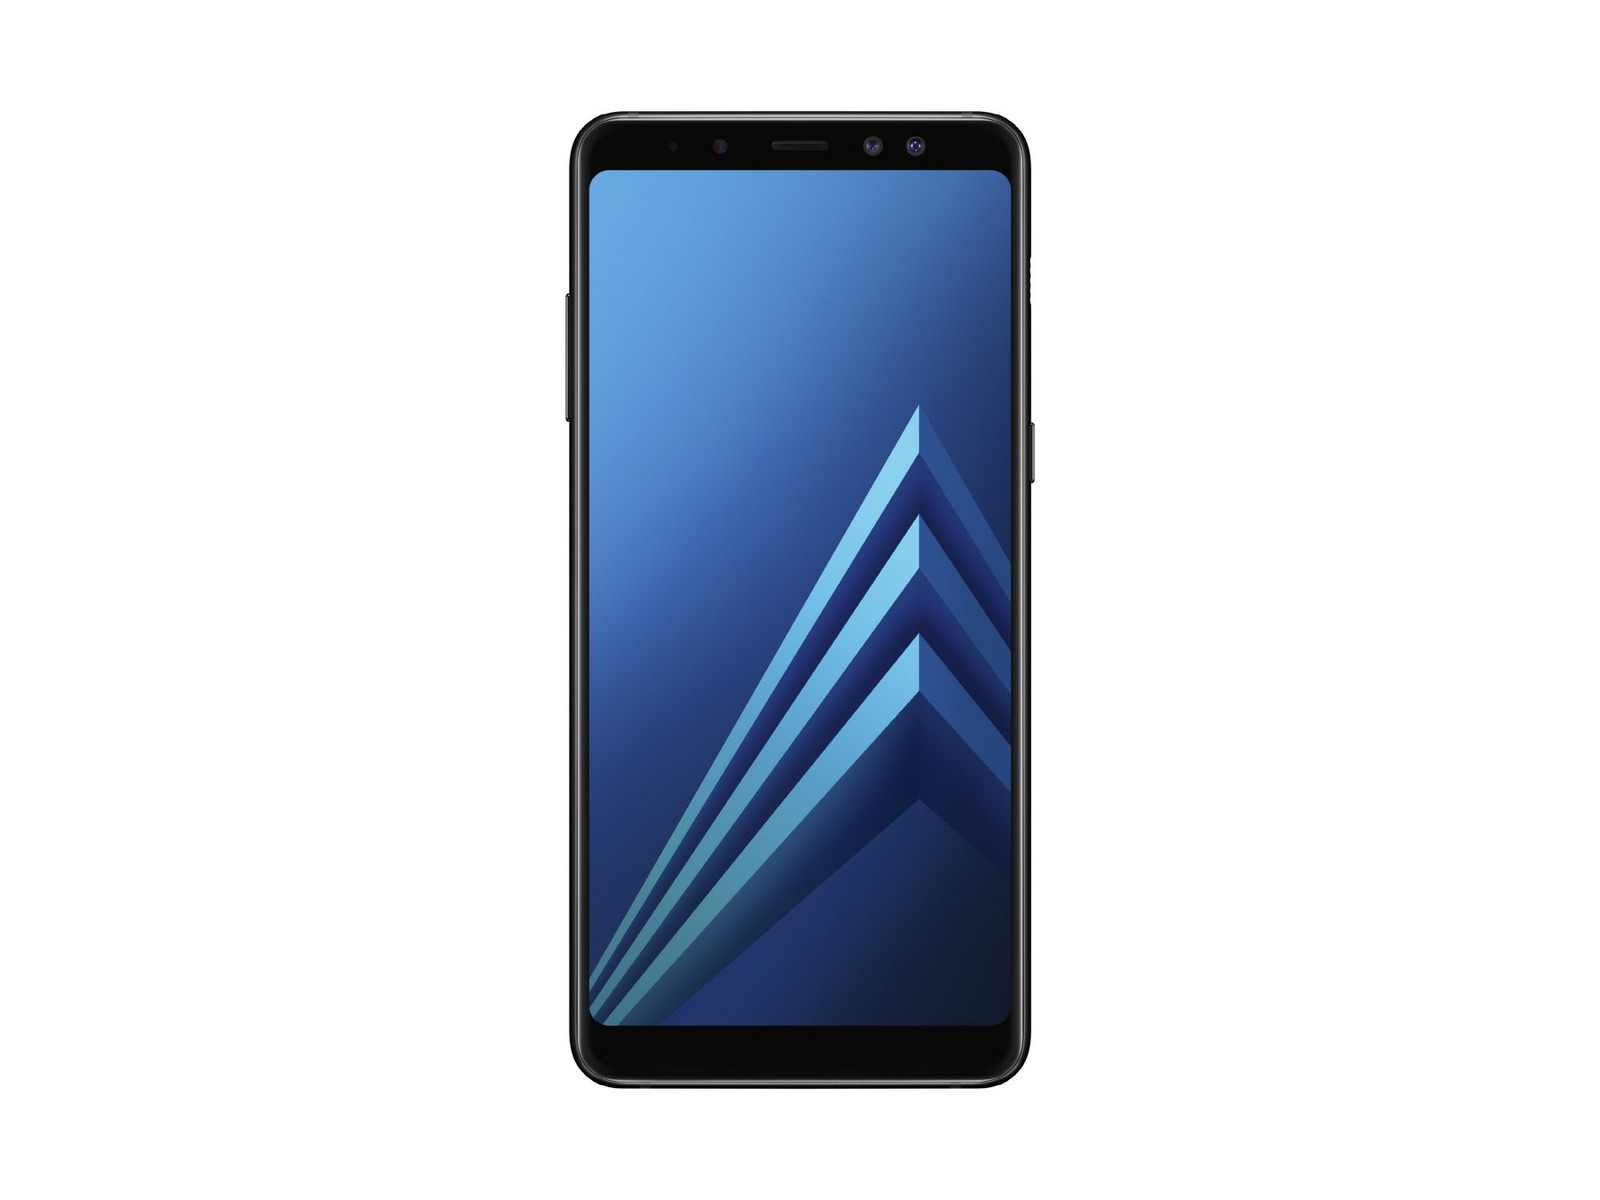 64 bit android phones under 10000